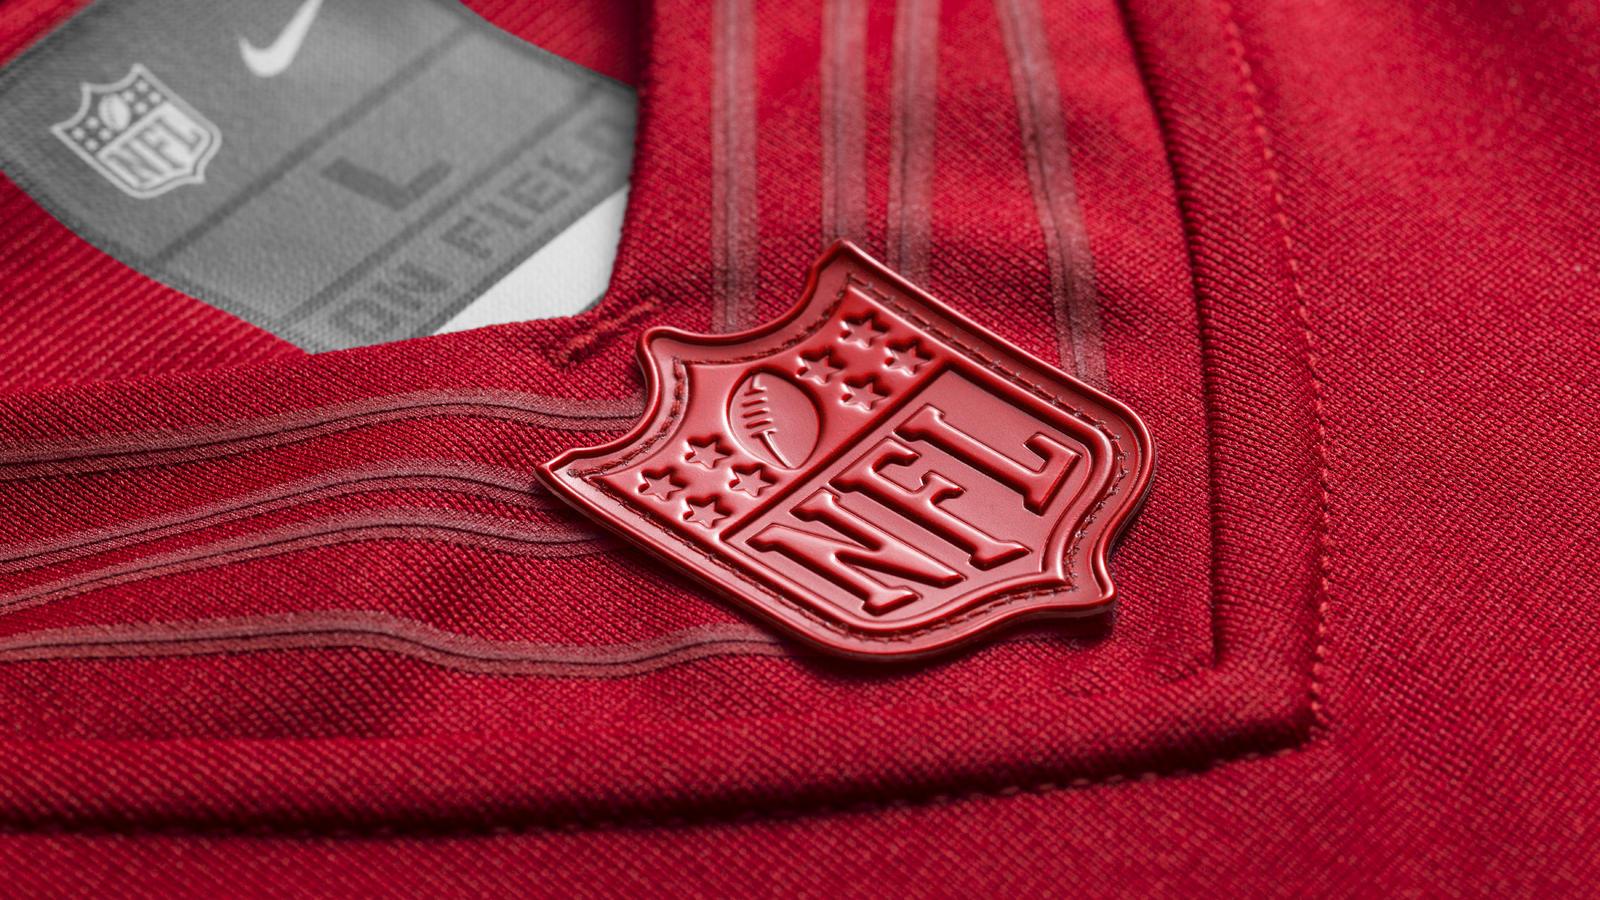 fa13_at_drenchpack_49ers_details_001_lr